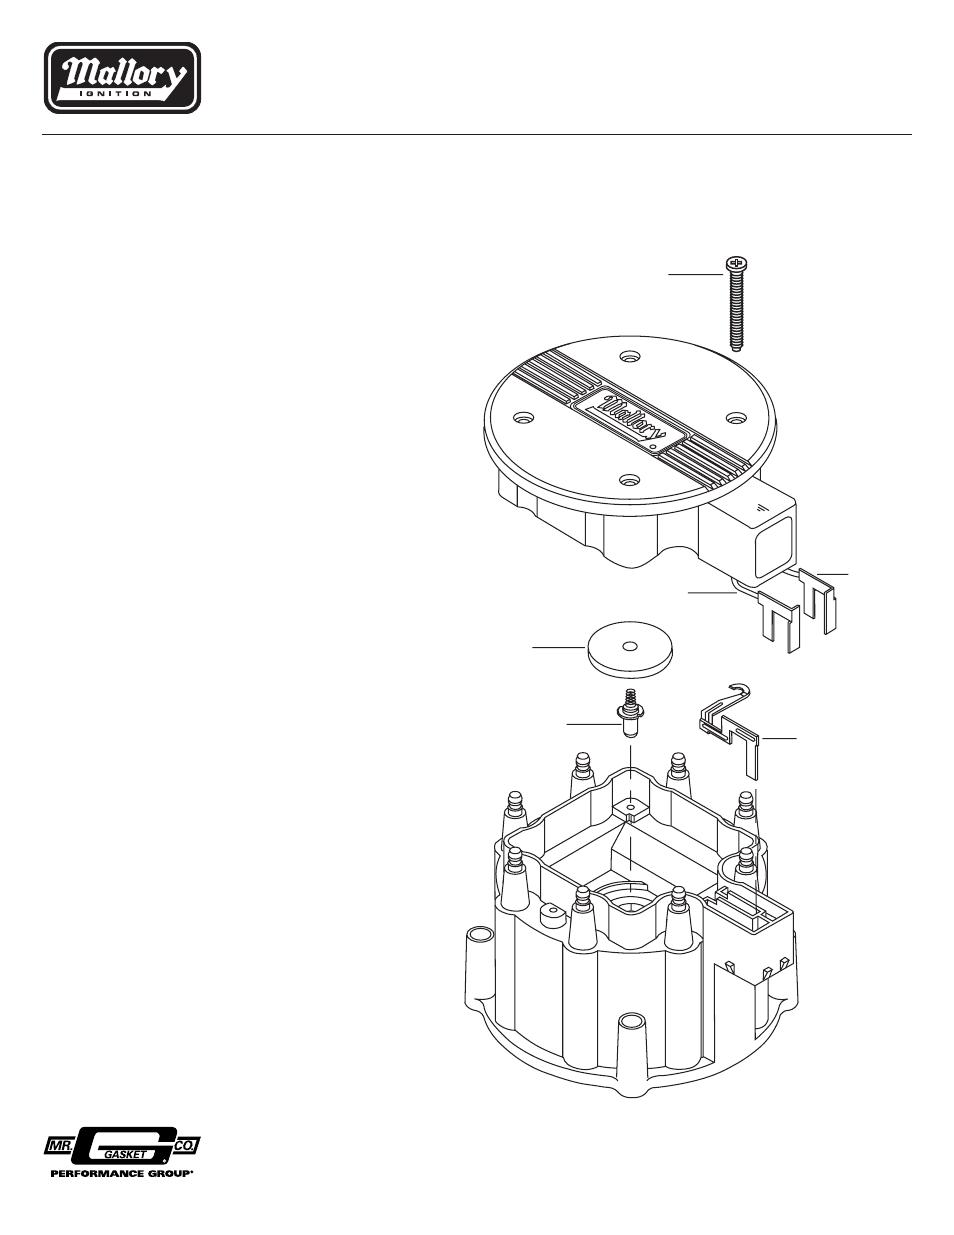 hight resolution of mallory ignition mallory hei performance coil 29212 29215 usermallory ignition mallory hei performance coil 29212 29215 user manual